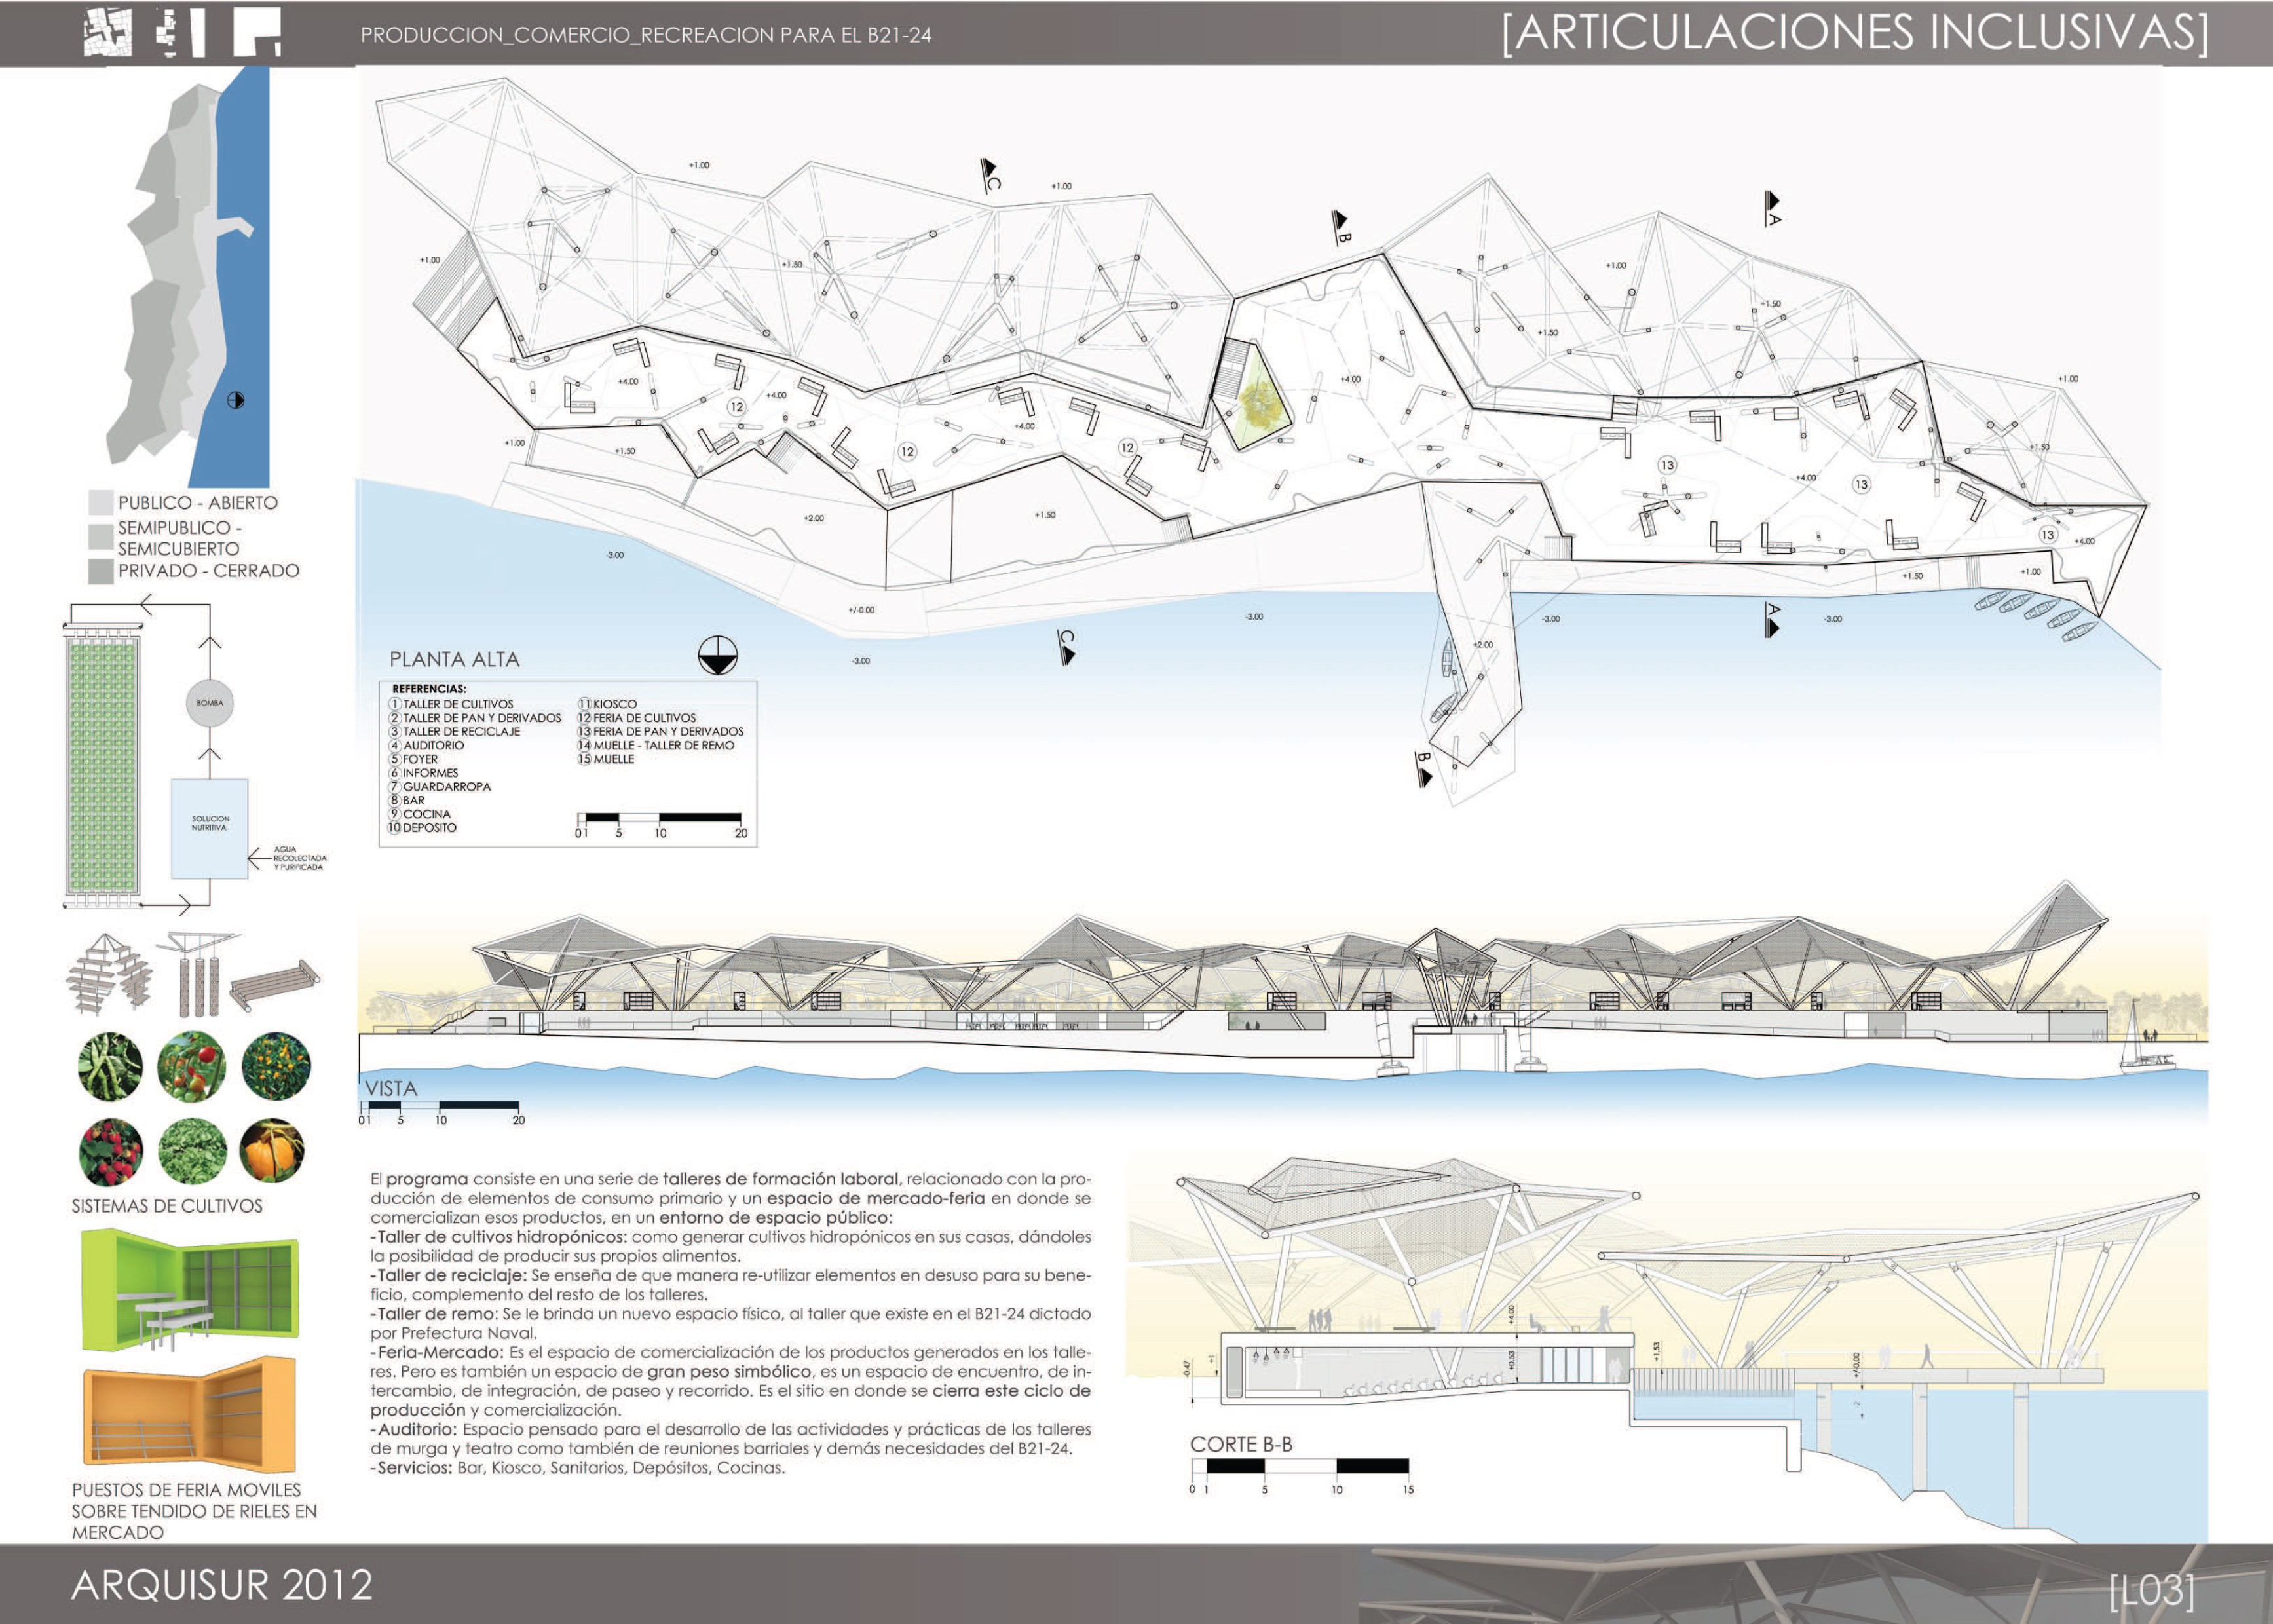 ARTICULACIONES INCLUSIVAS_ARQUISUR2012.pdf